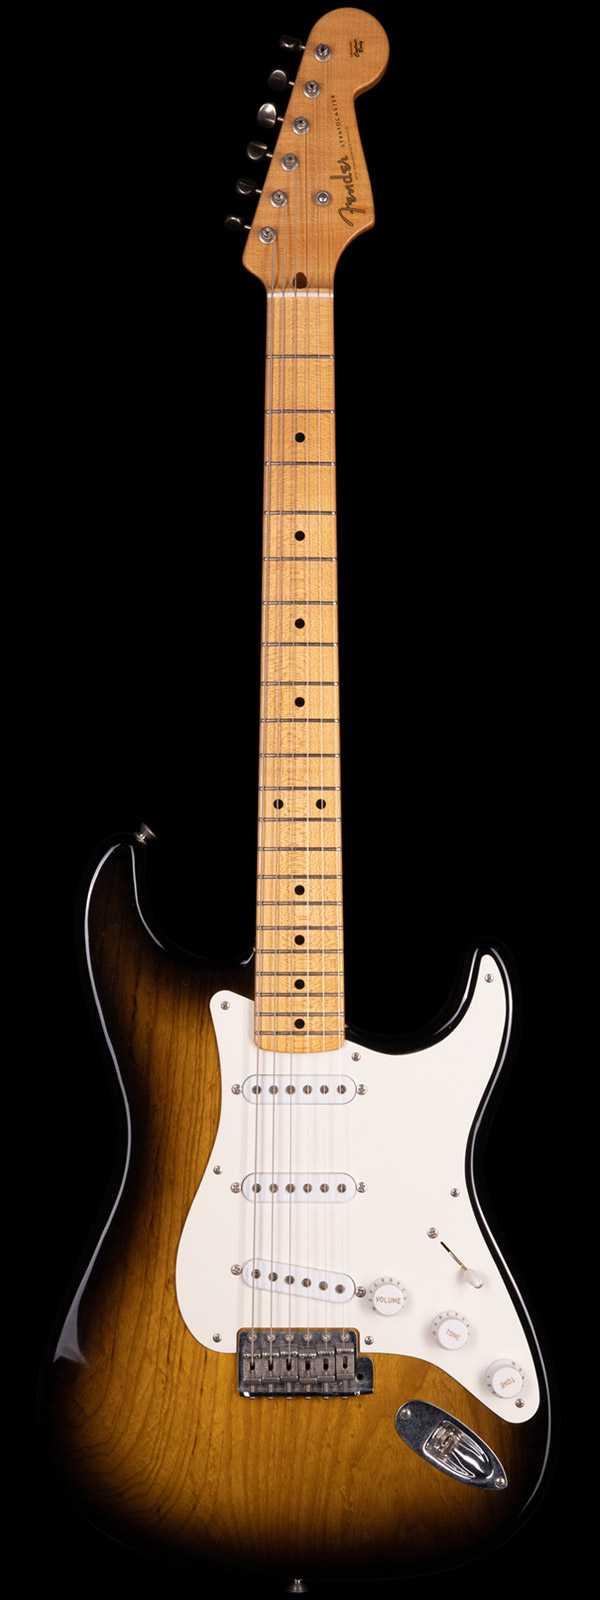 Fender Custom Shop 2004 Masterbuilt John English 1954 50th Anniversary Stratocaster Relic 2-Tone Sunburst